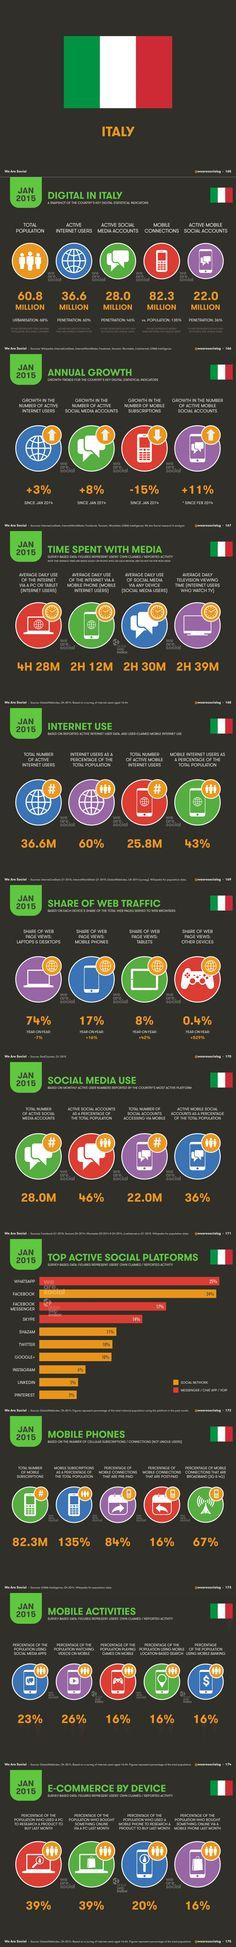 Digital nel 2015 in Italia secondo WeAreSocial